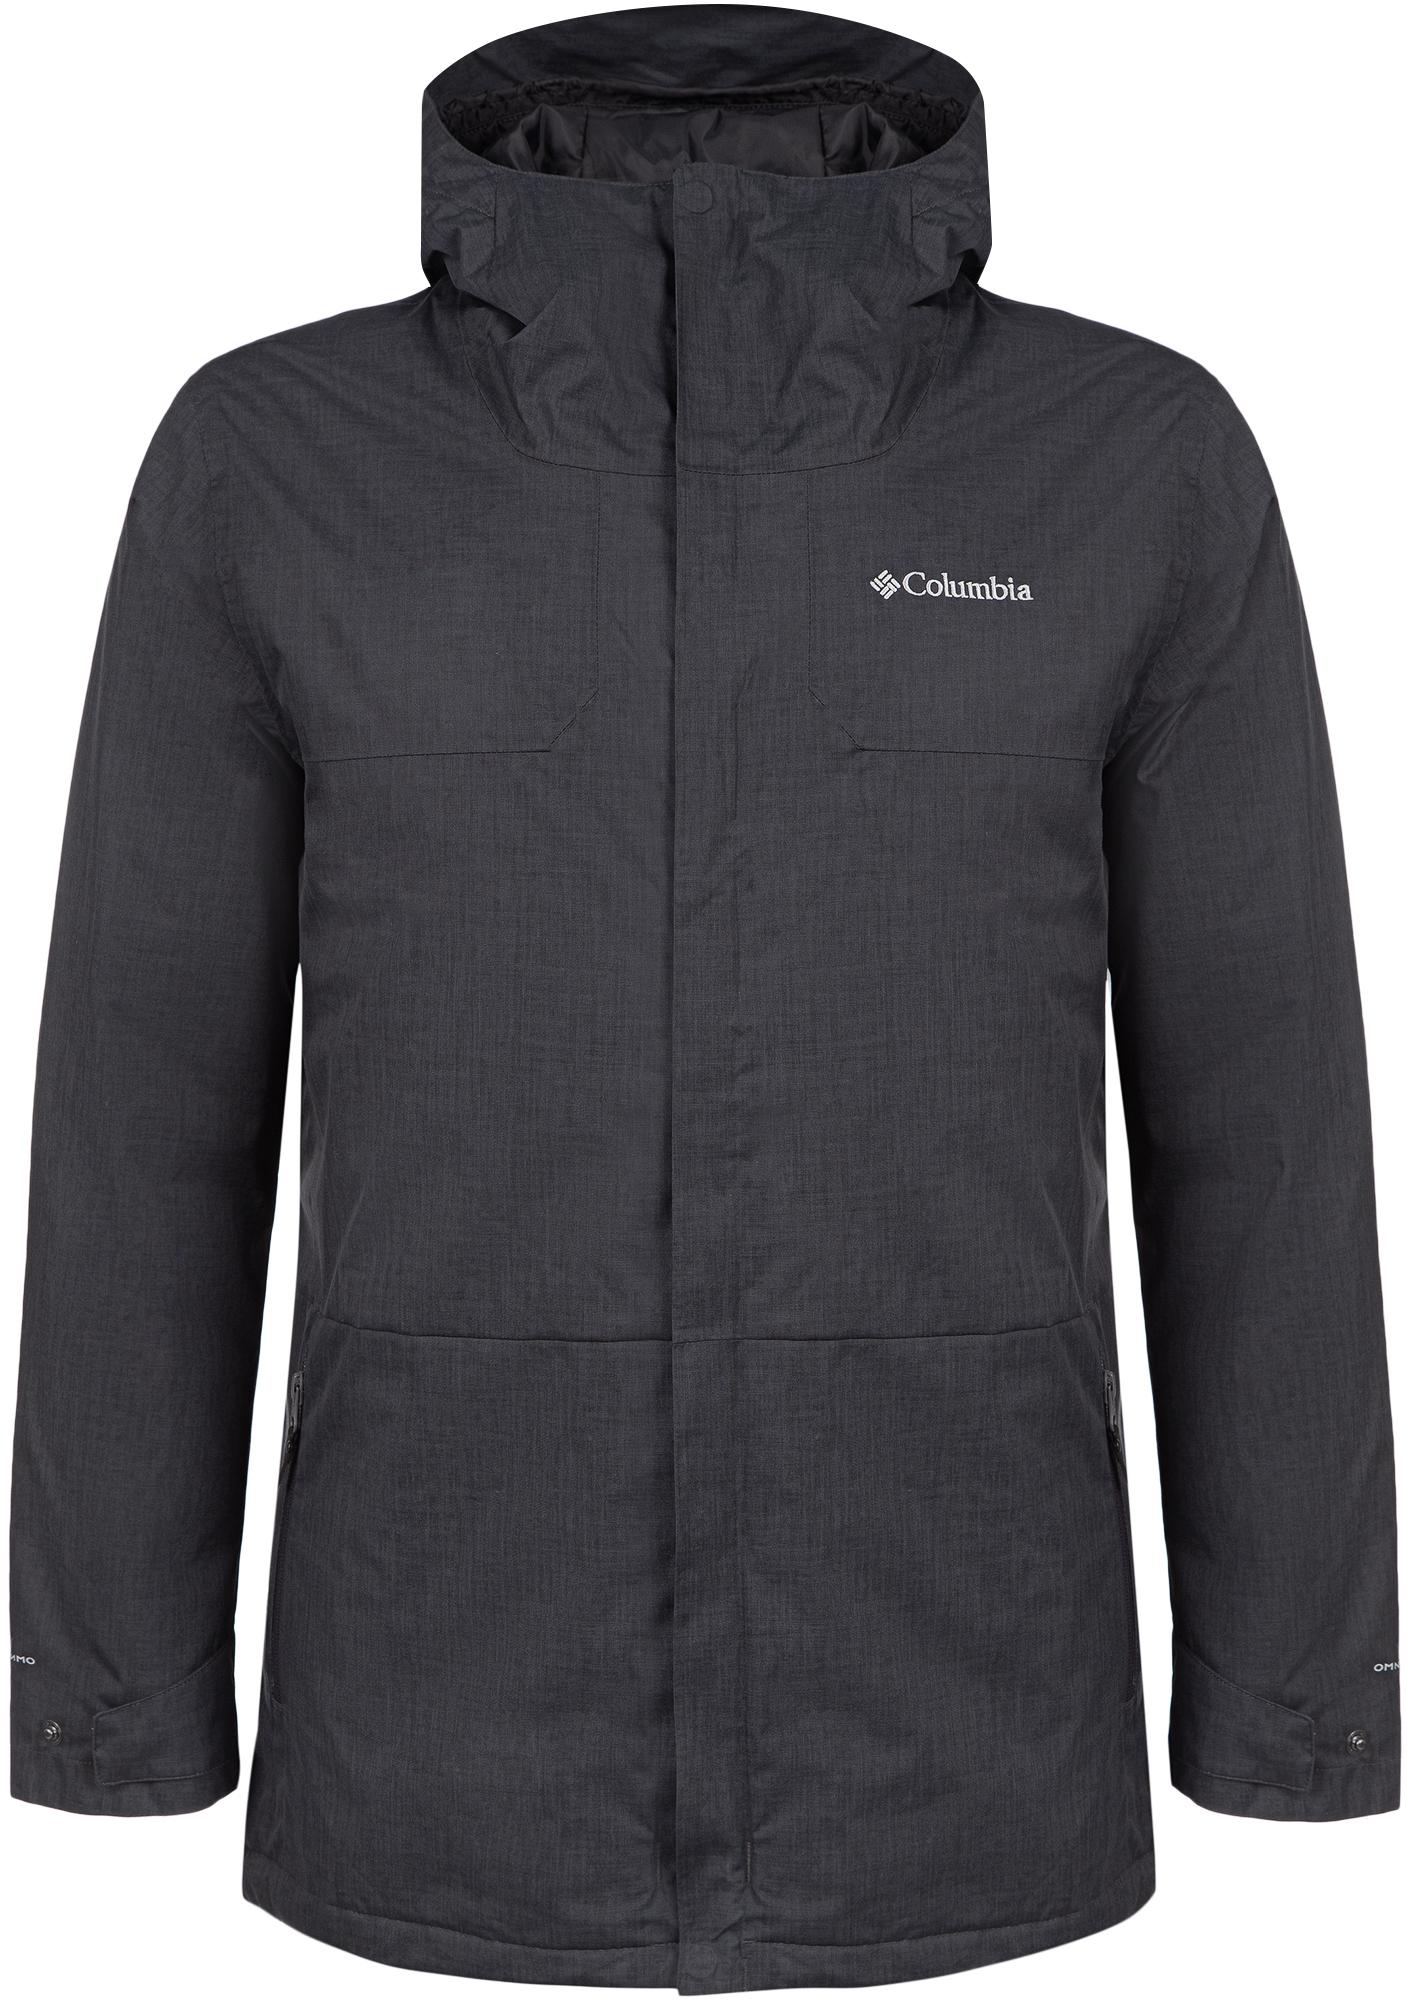 Columbia Куртка утепленная мужская Columbia Rowland Heights, размер 56 цена и фото